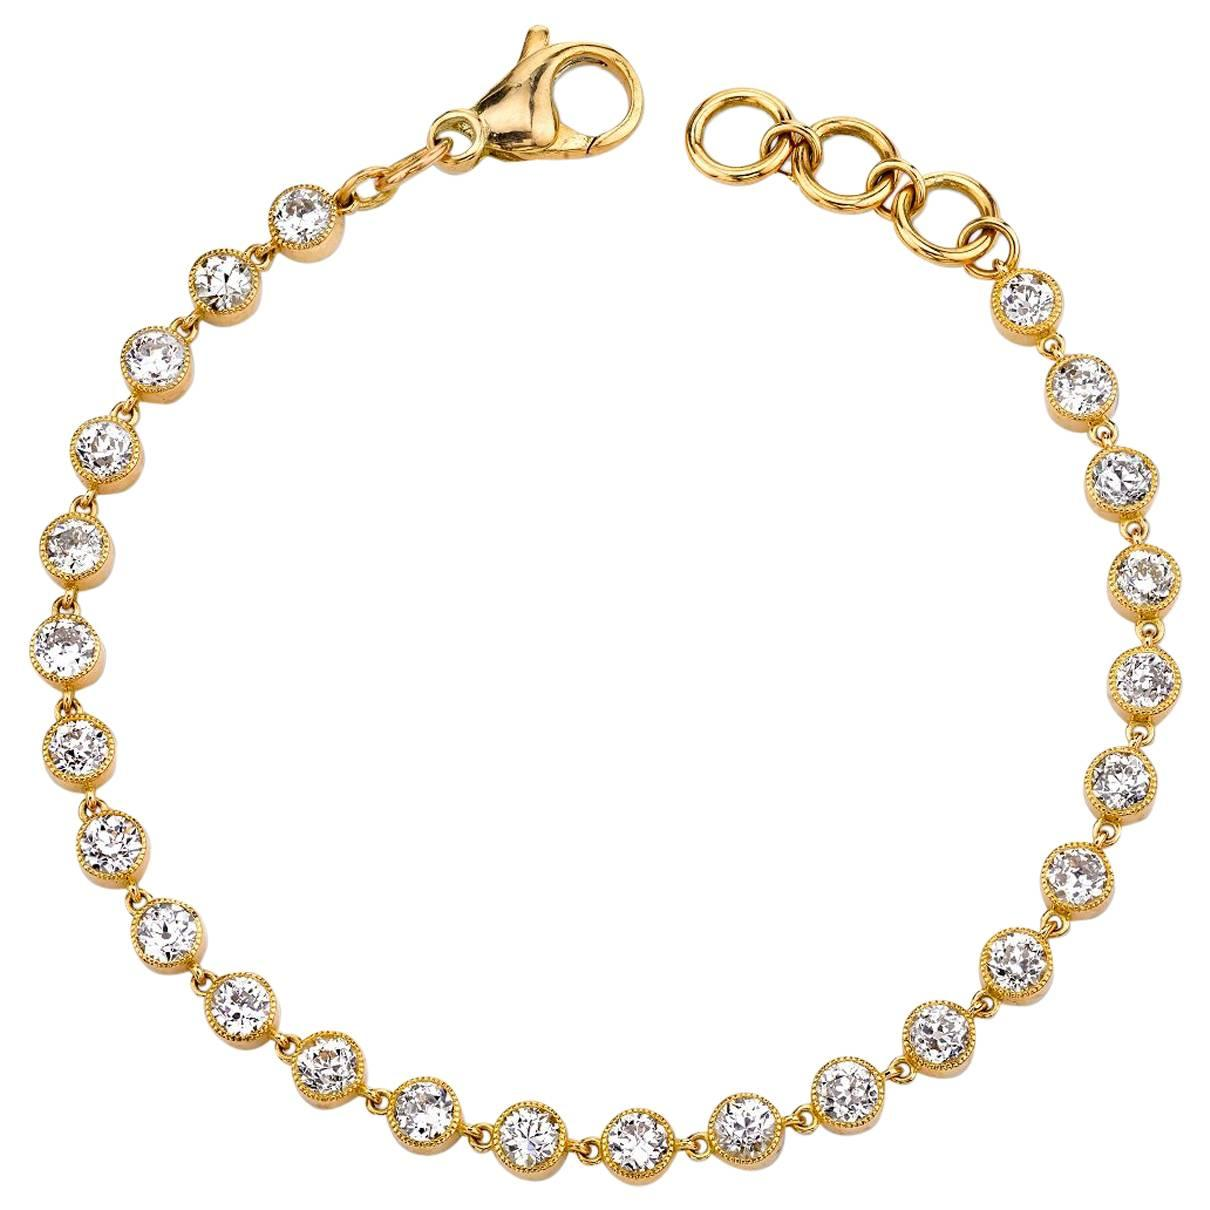 Handcrafted Gabby Old European Cut Diamond Tennis Bracelet by Single Stone